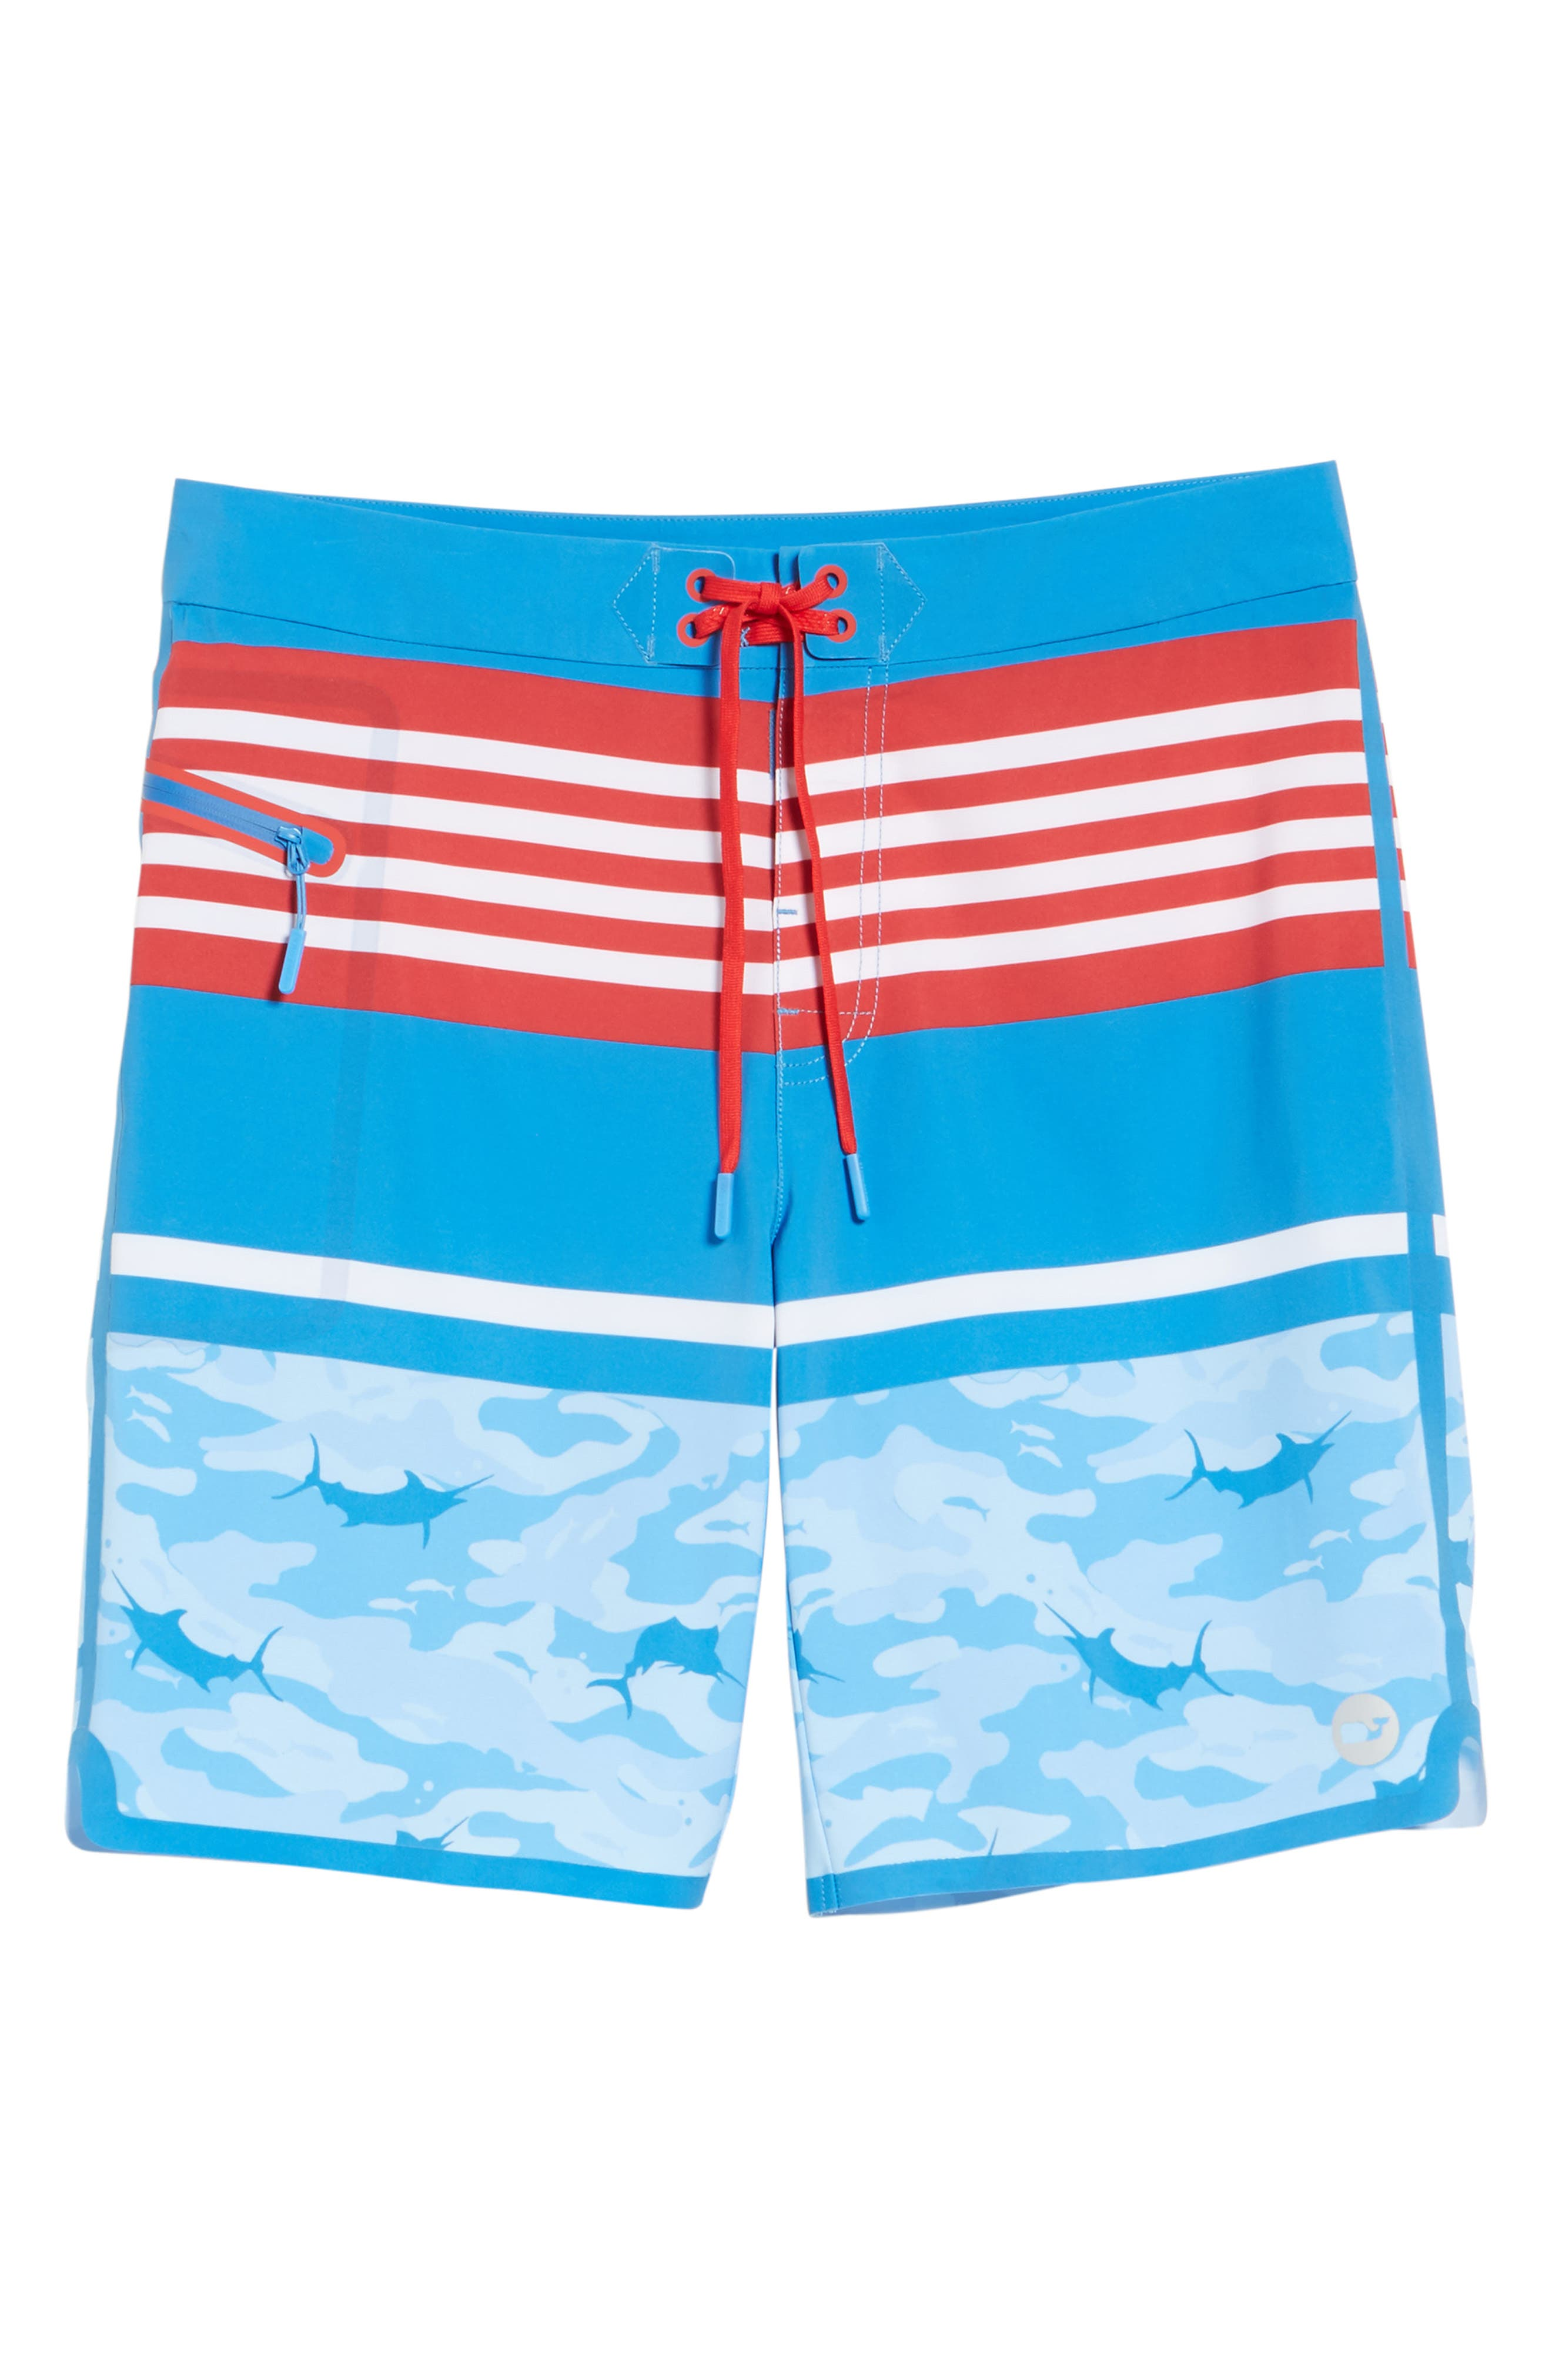 Fish Camo Stripe Board Shorts,                             Alternate thumbnail 6, color,                             400